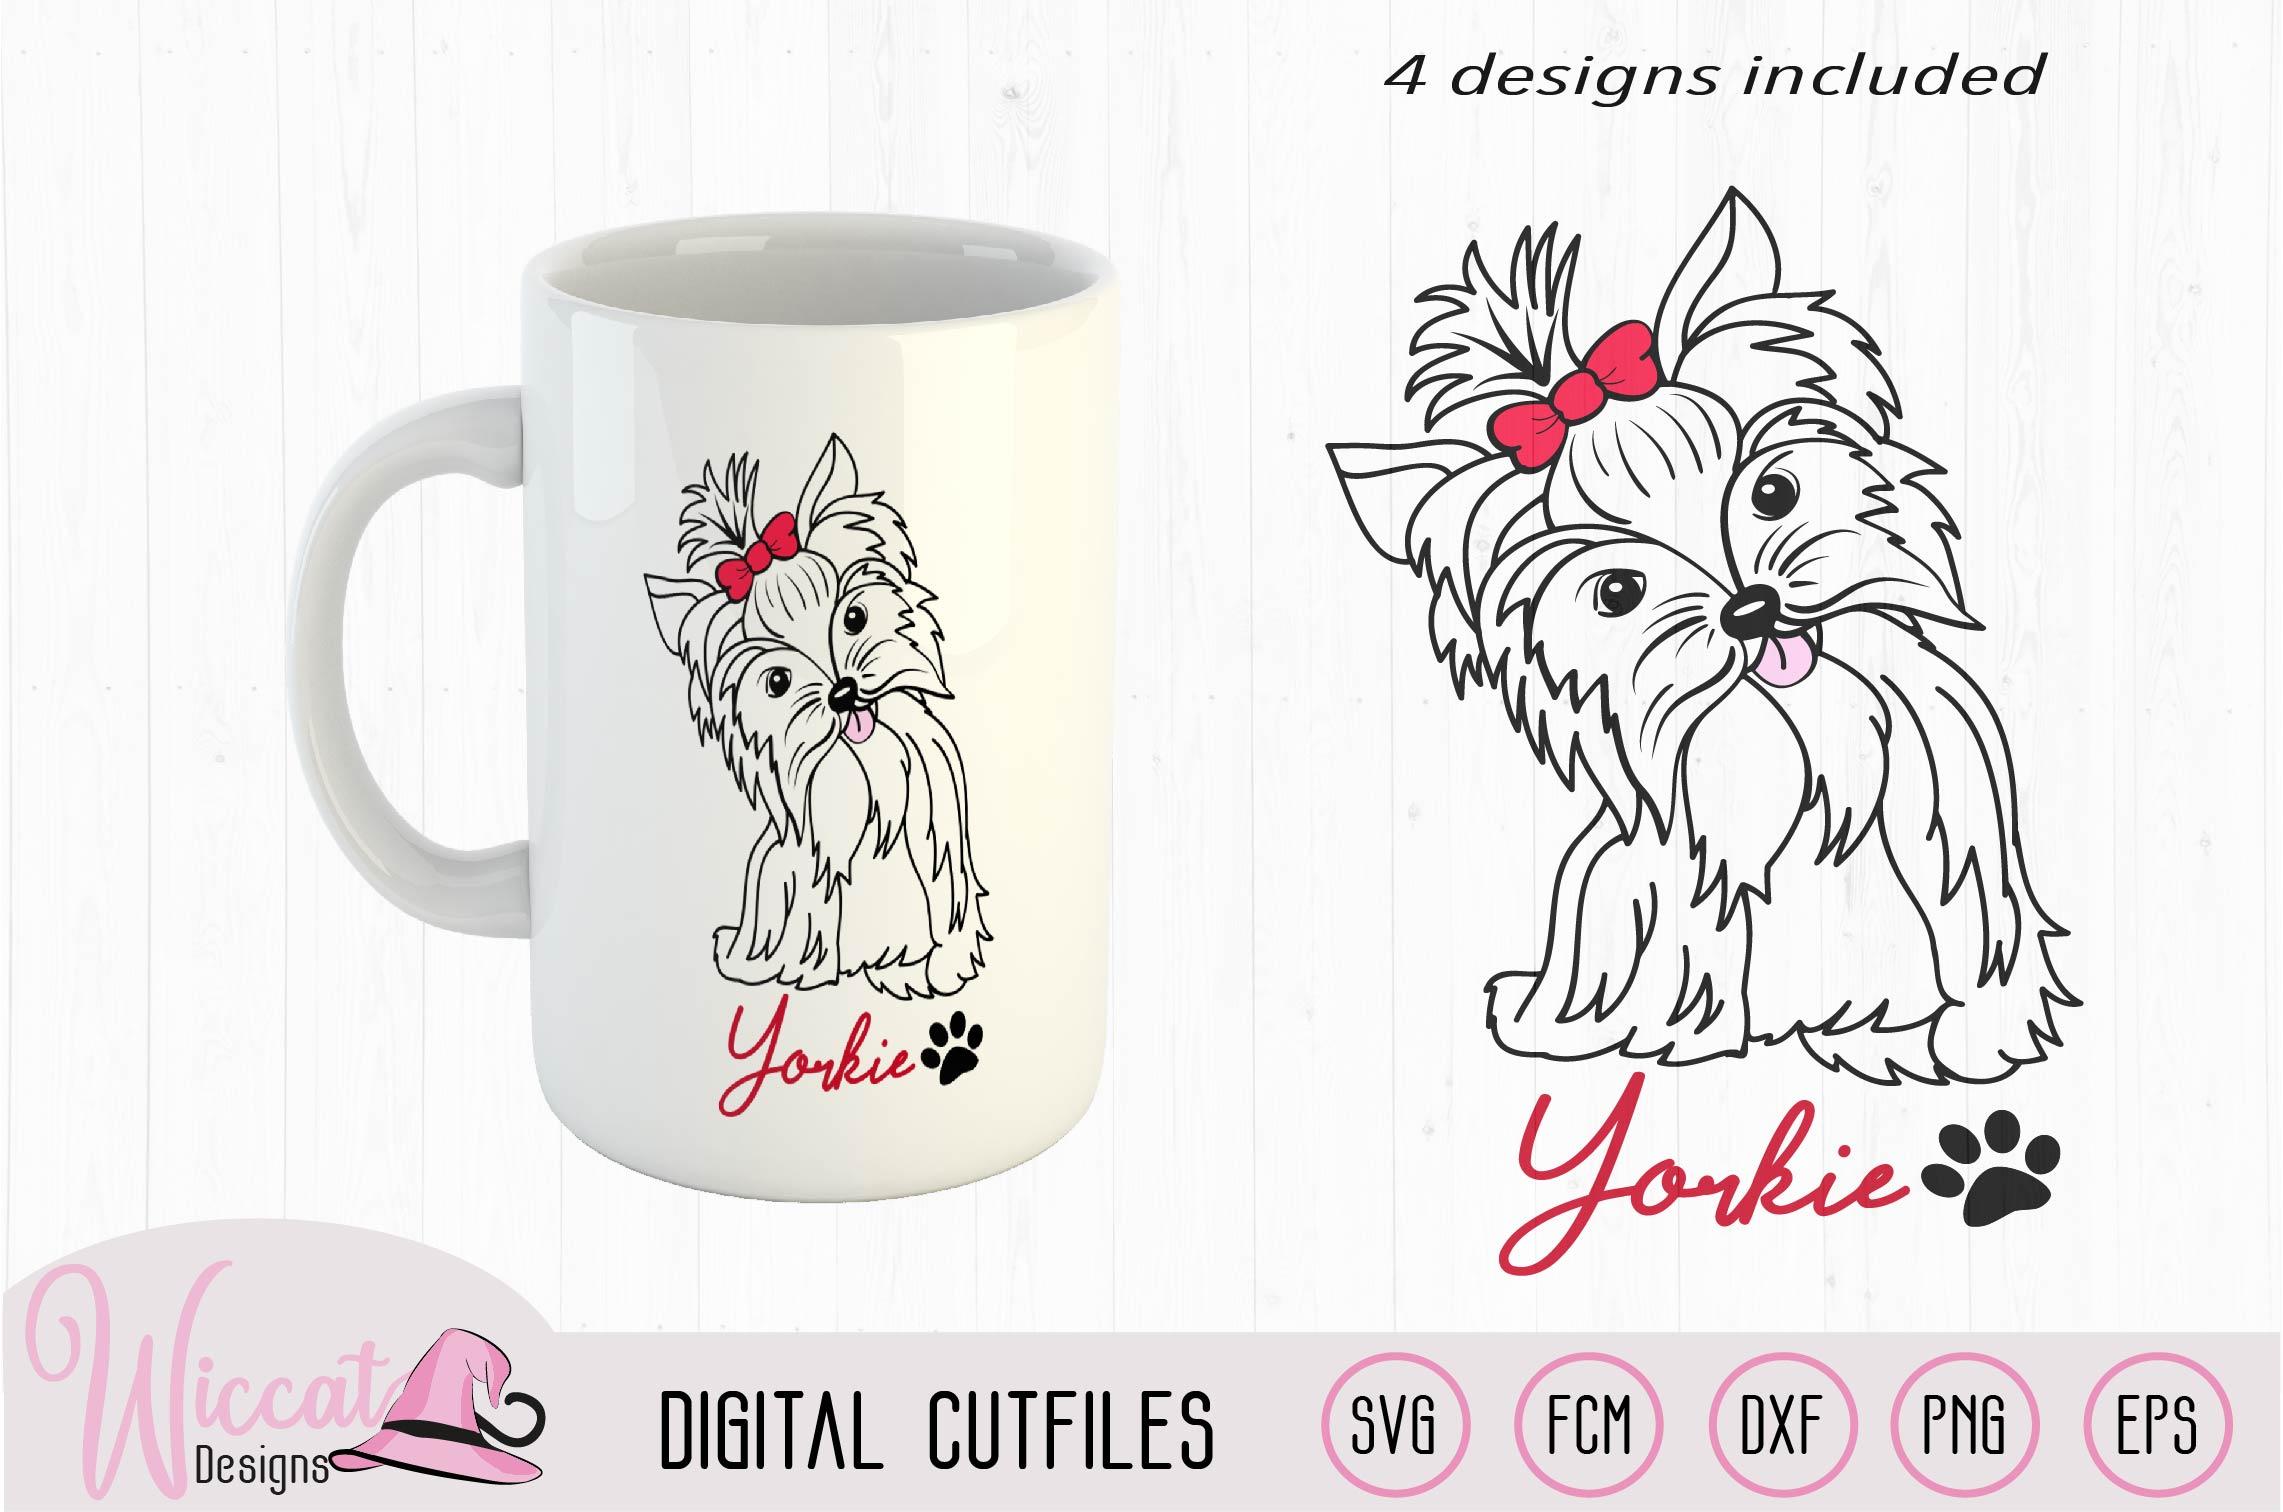 Yorkie svg, Yorkie color svg, Girl dog, girly dog svg example image 2